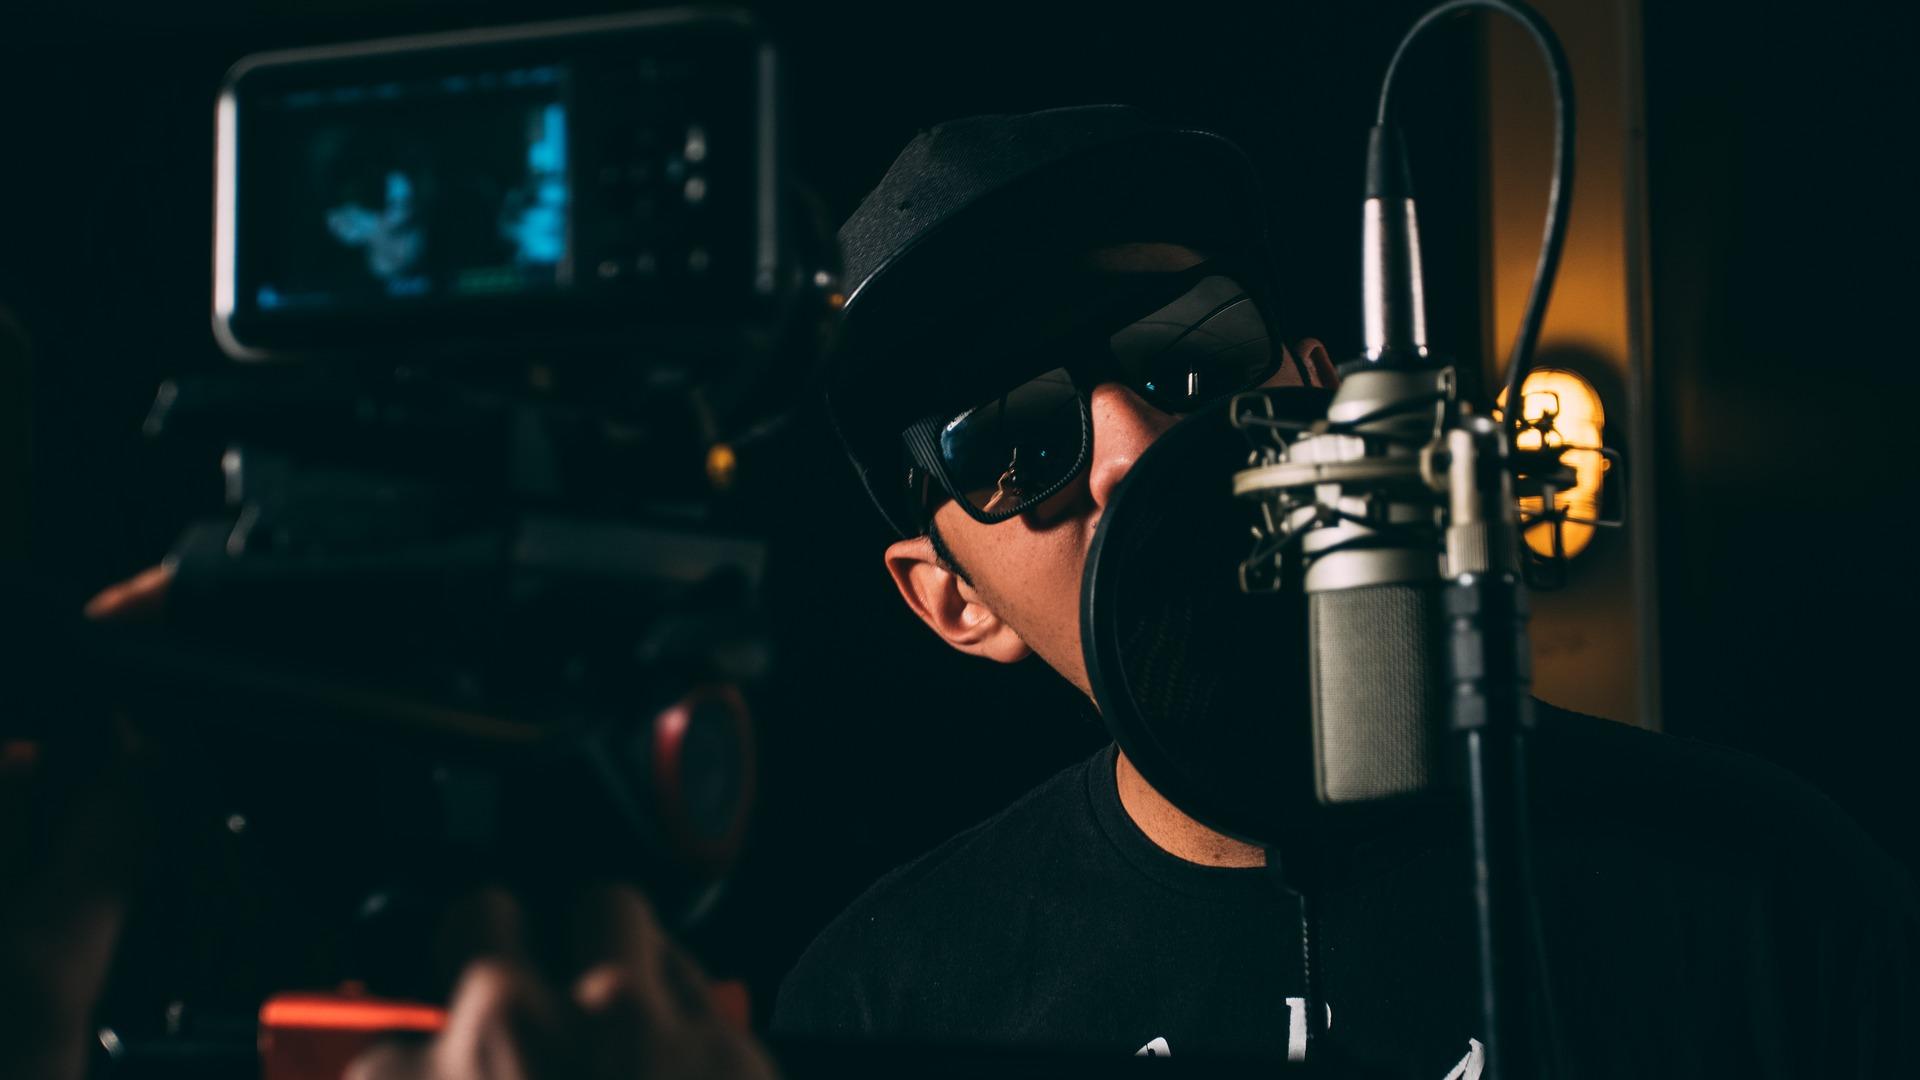 DJ Singing and Mixing